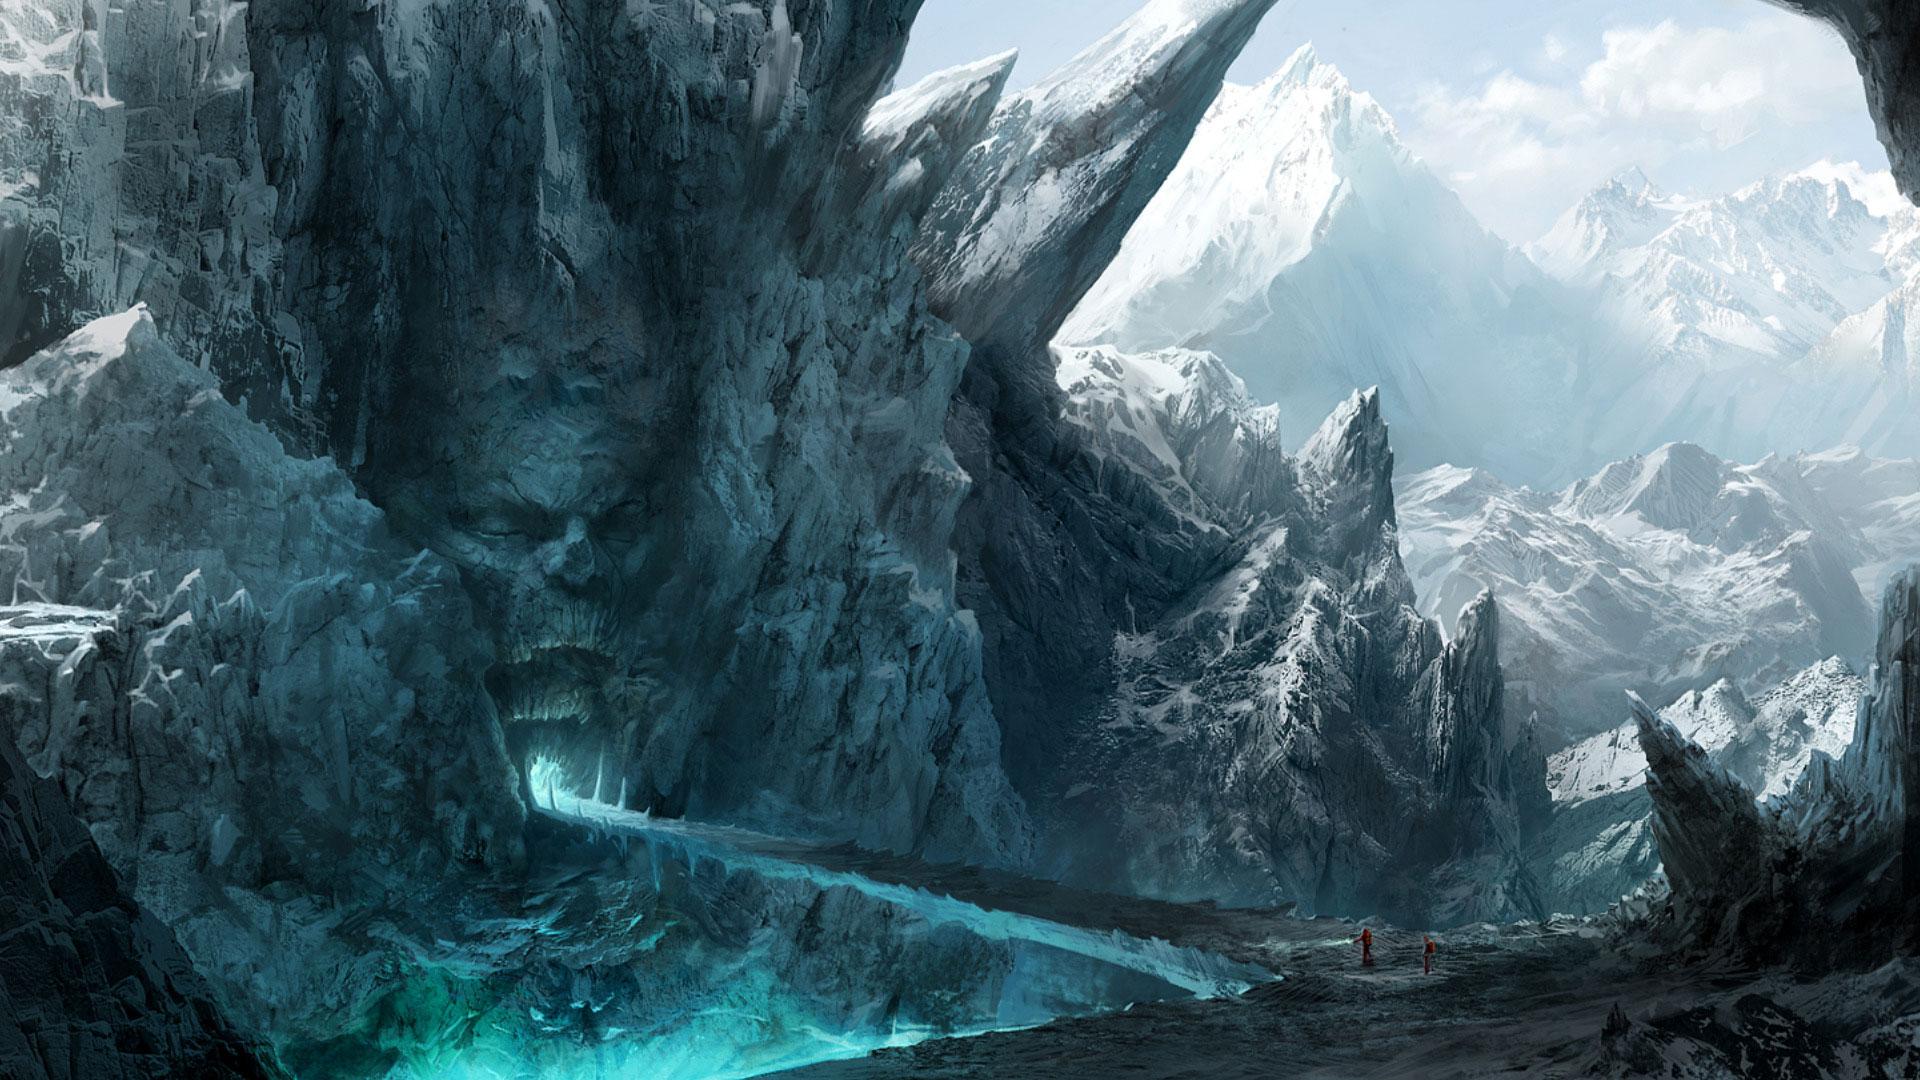 Daoldarah-Crystal-Dreagon-Saga-Page-Wakawadabingbang-Guild-Forums-Gaia-Online-wallpaper-wpc5803929